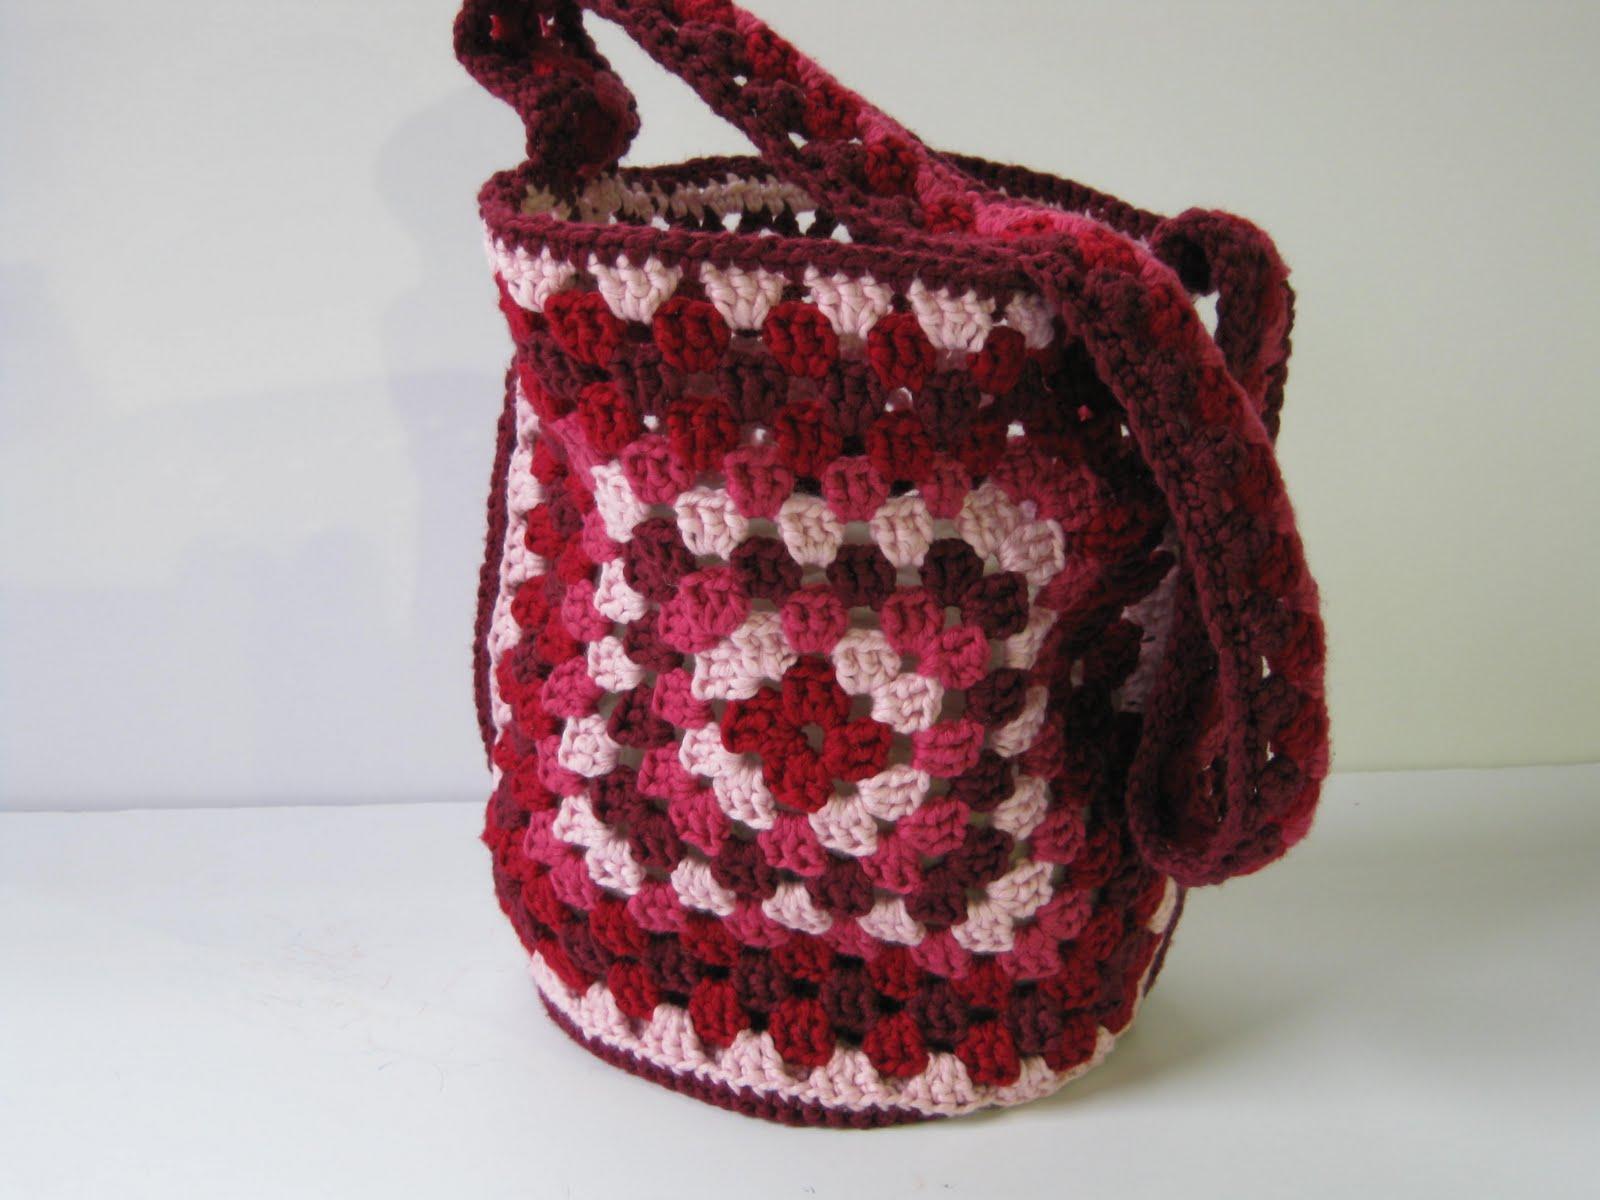 Free Granny Square Bag Pattern : Granny Square Bag Free Pattern http://oceanofstitches.blogspot.com ...